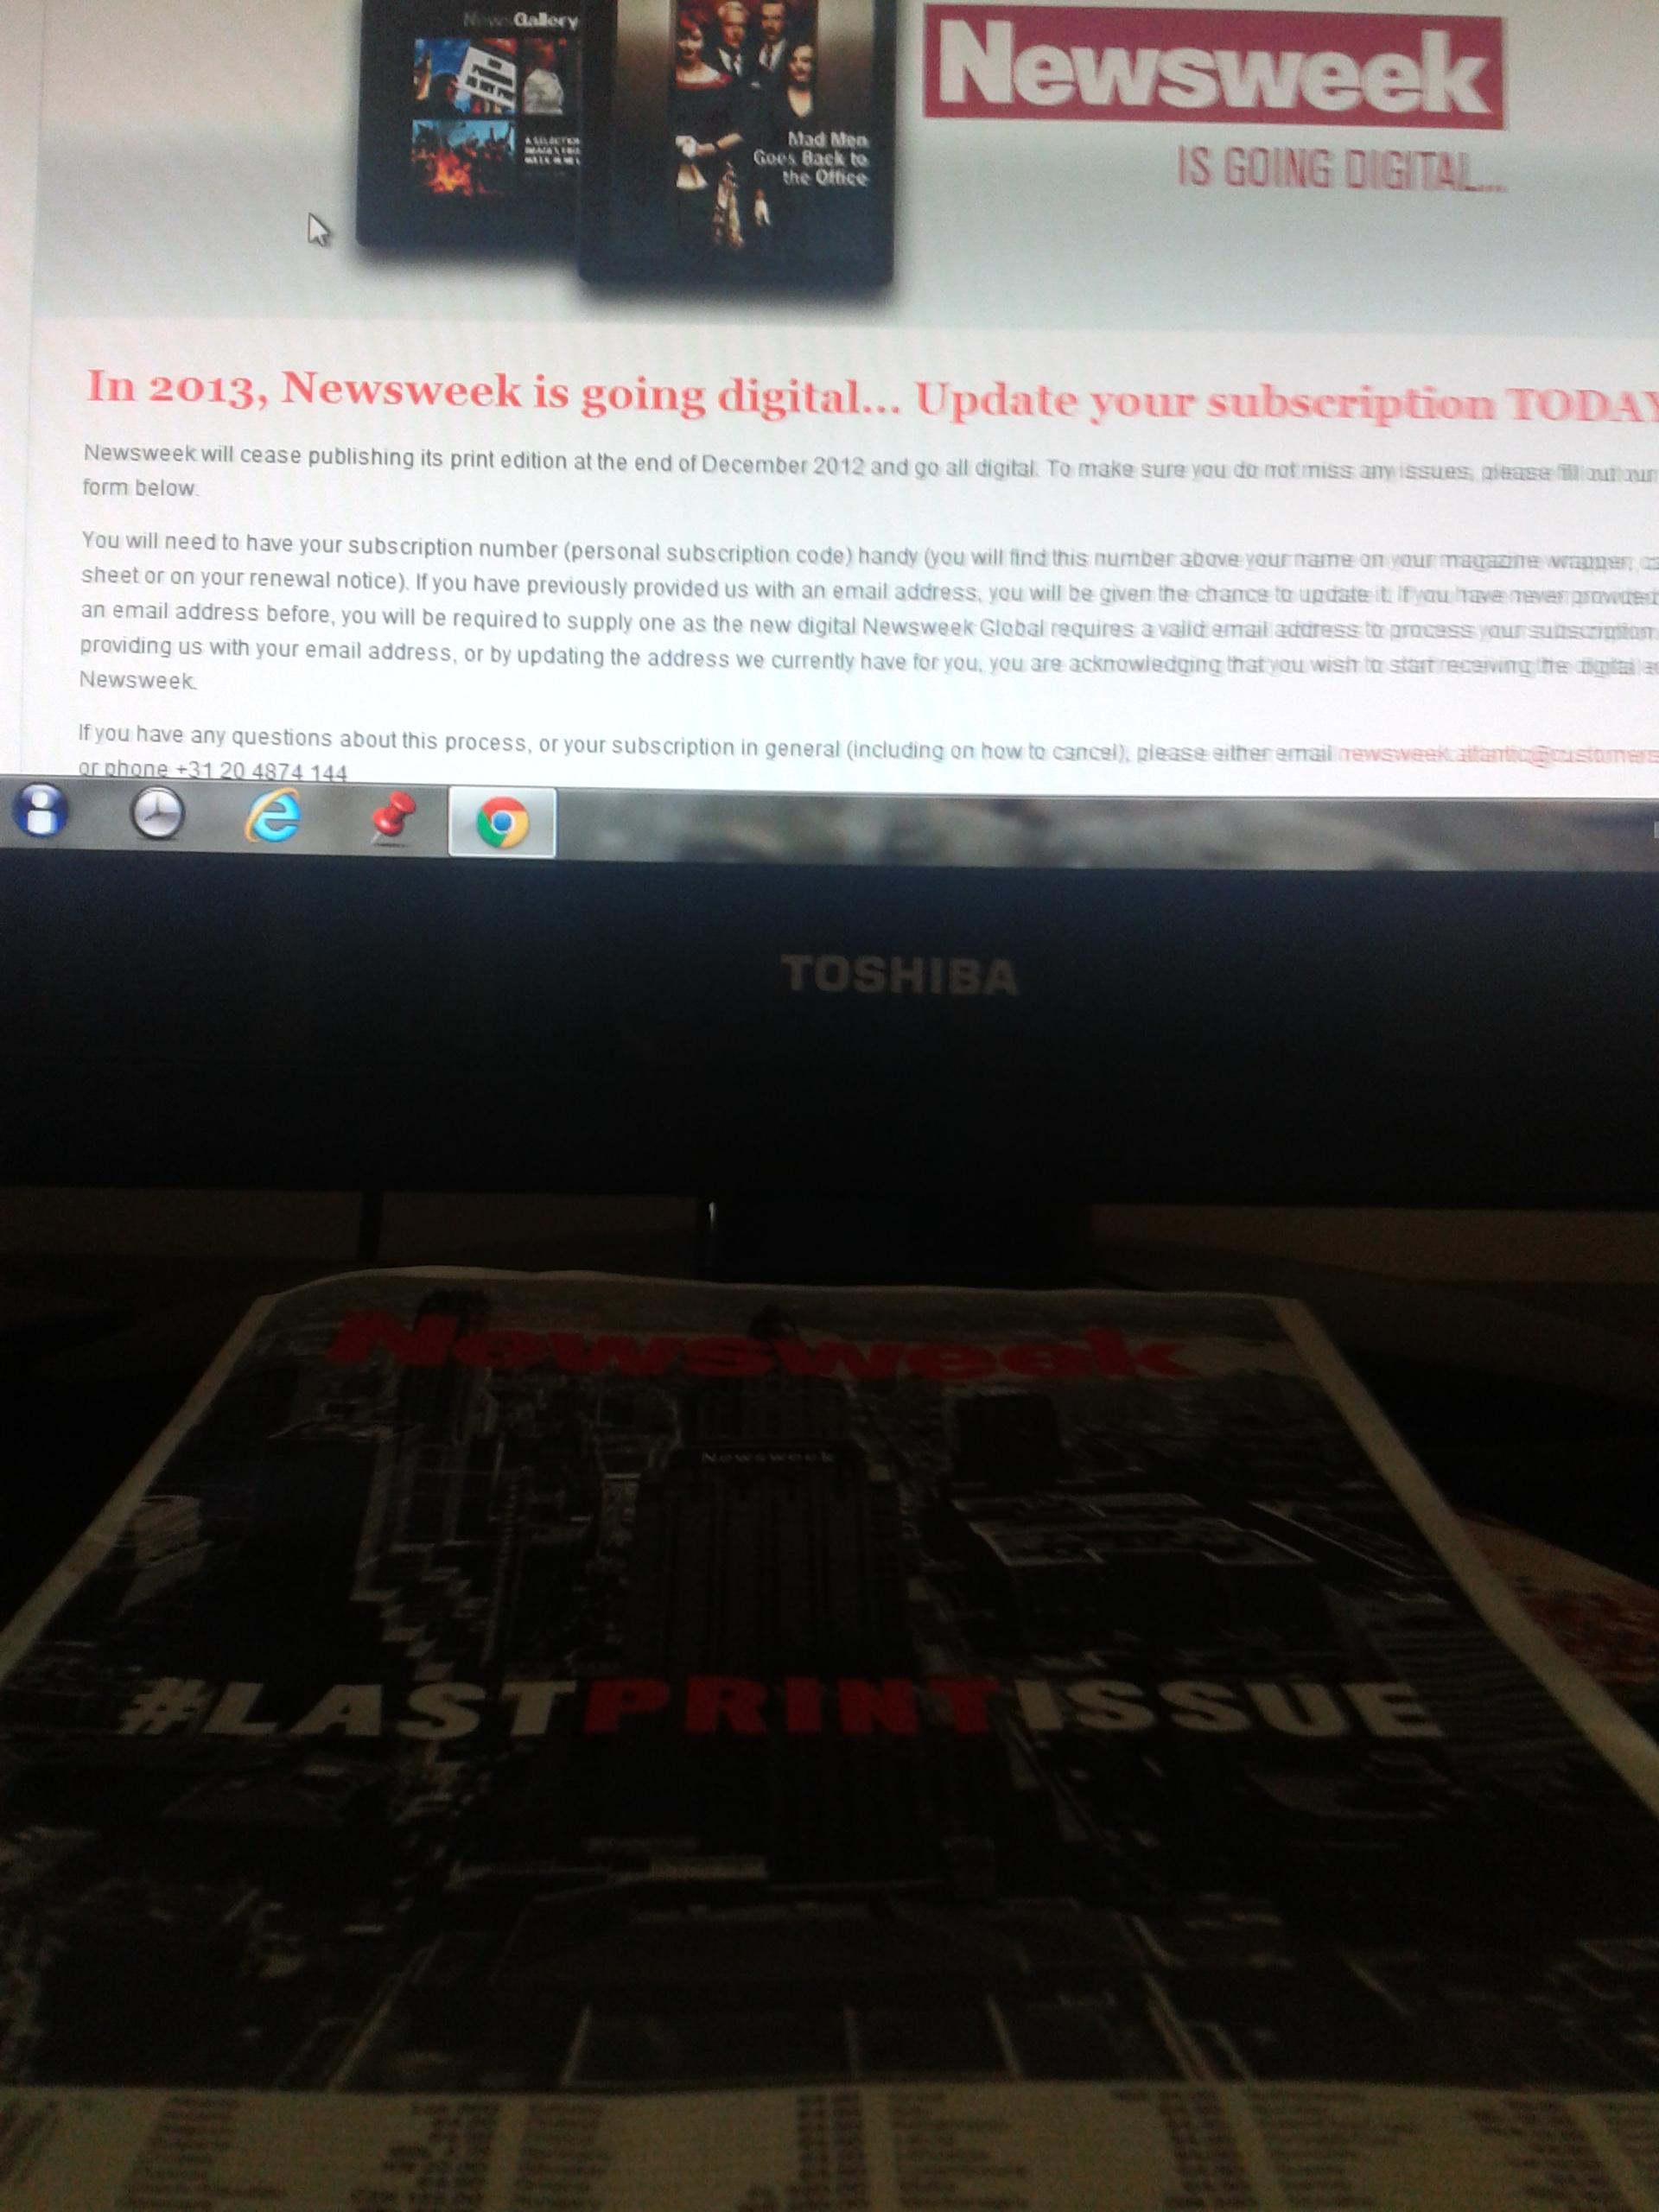 Newsweek #Lastprintissue cover